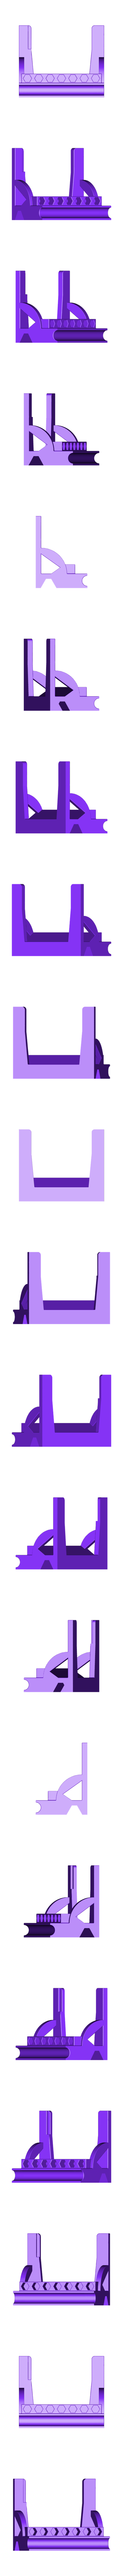 porte batterie v22.stl Download free STL file AEG BATTERY DOOR • 3D printer object, MME